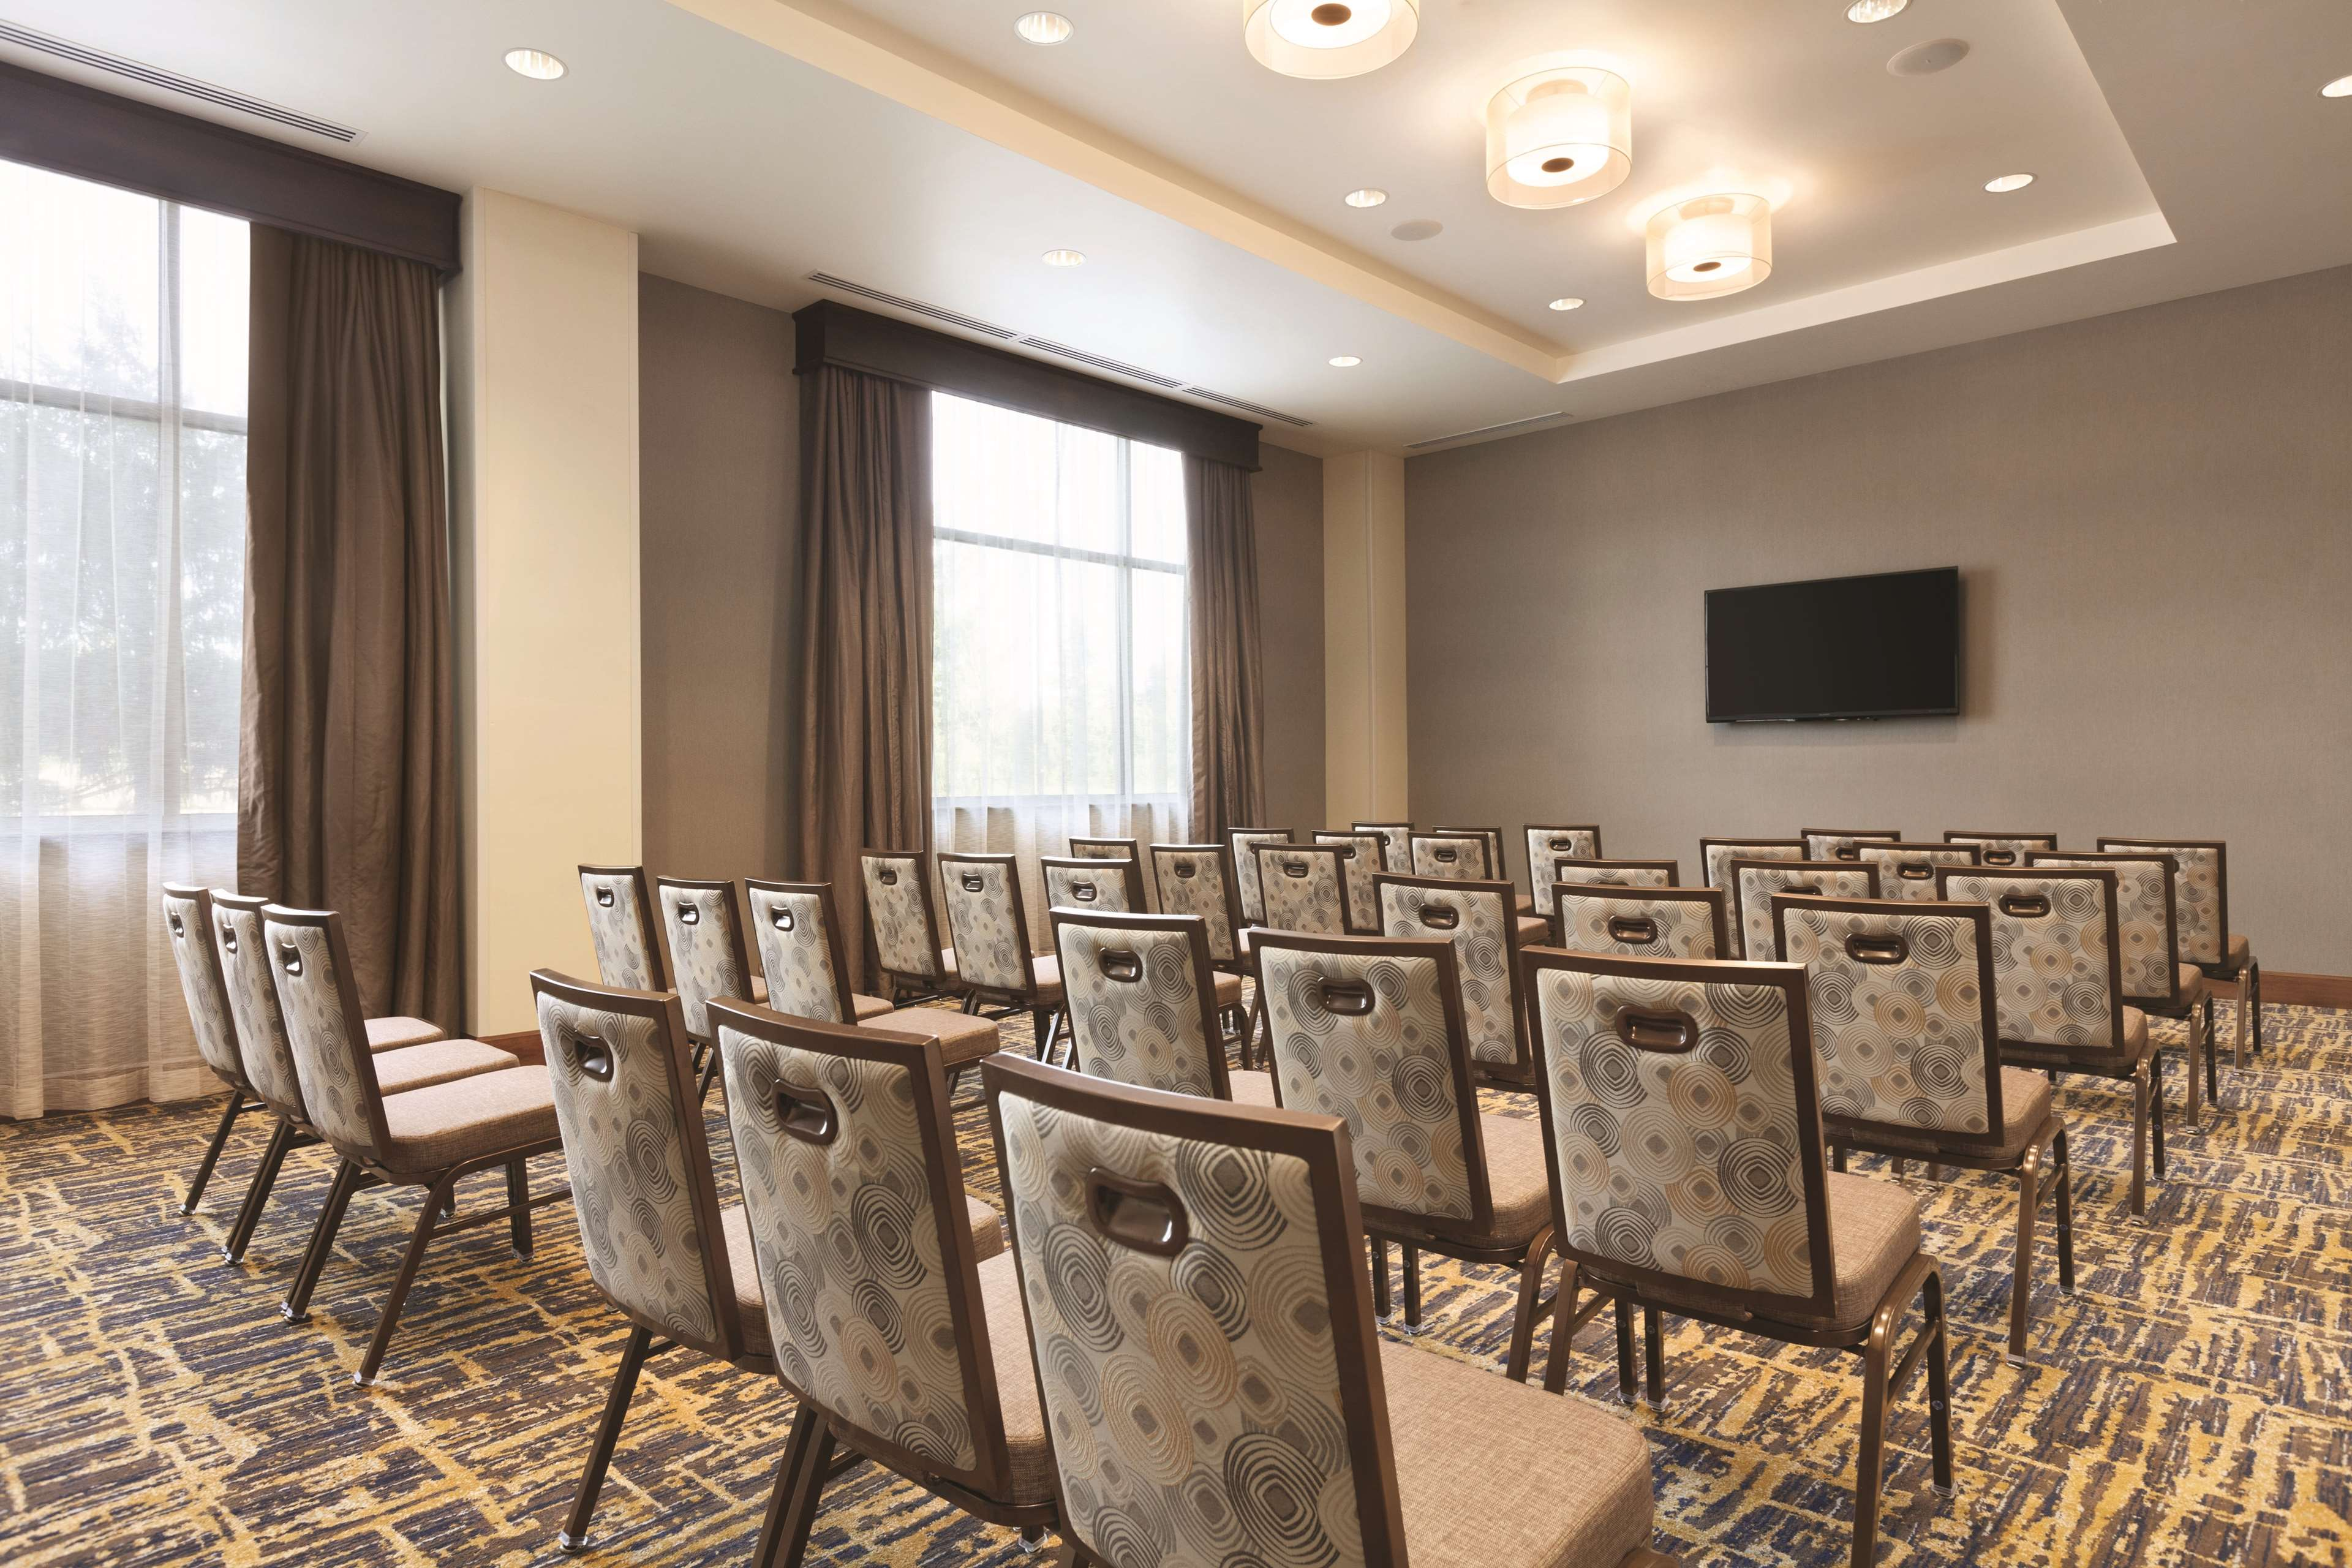 Embassy Suites by Hilton Portland Hillsboro, Oregon image 31